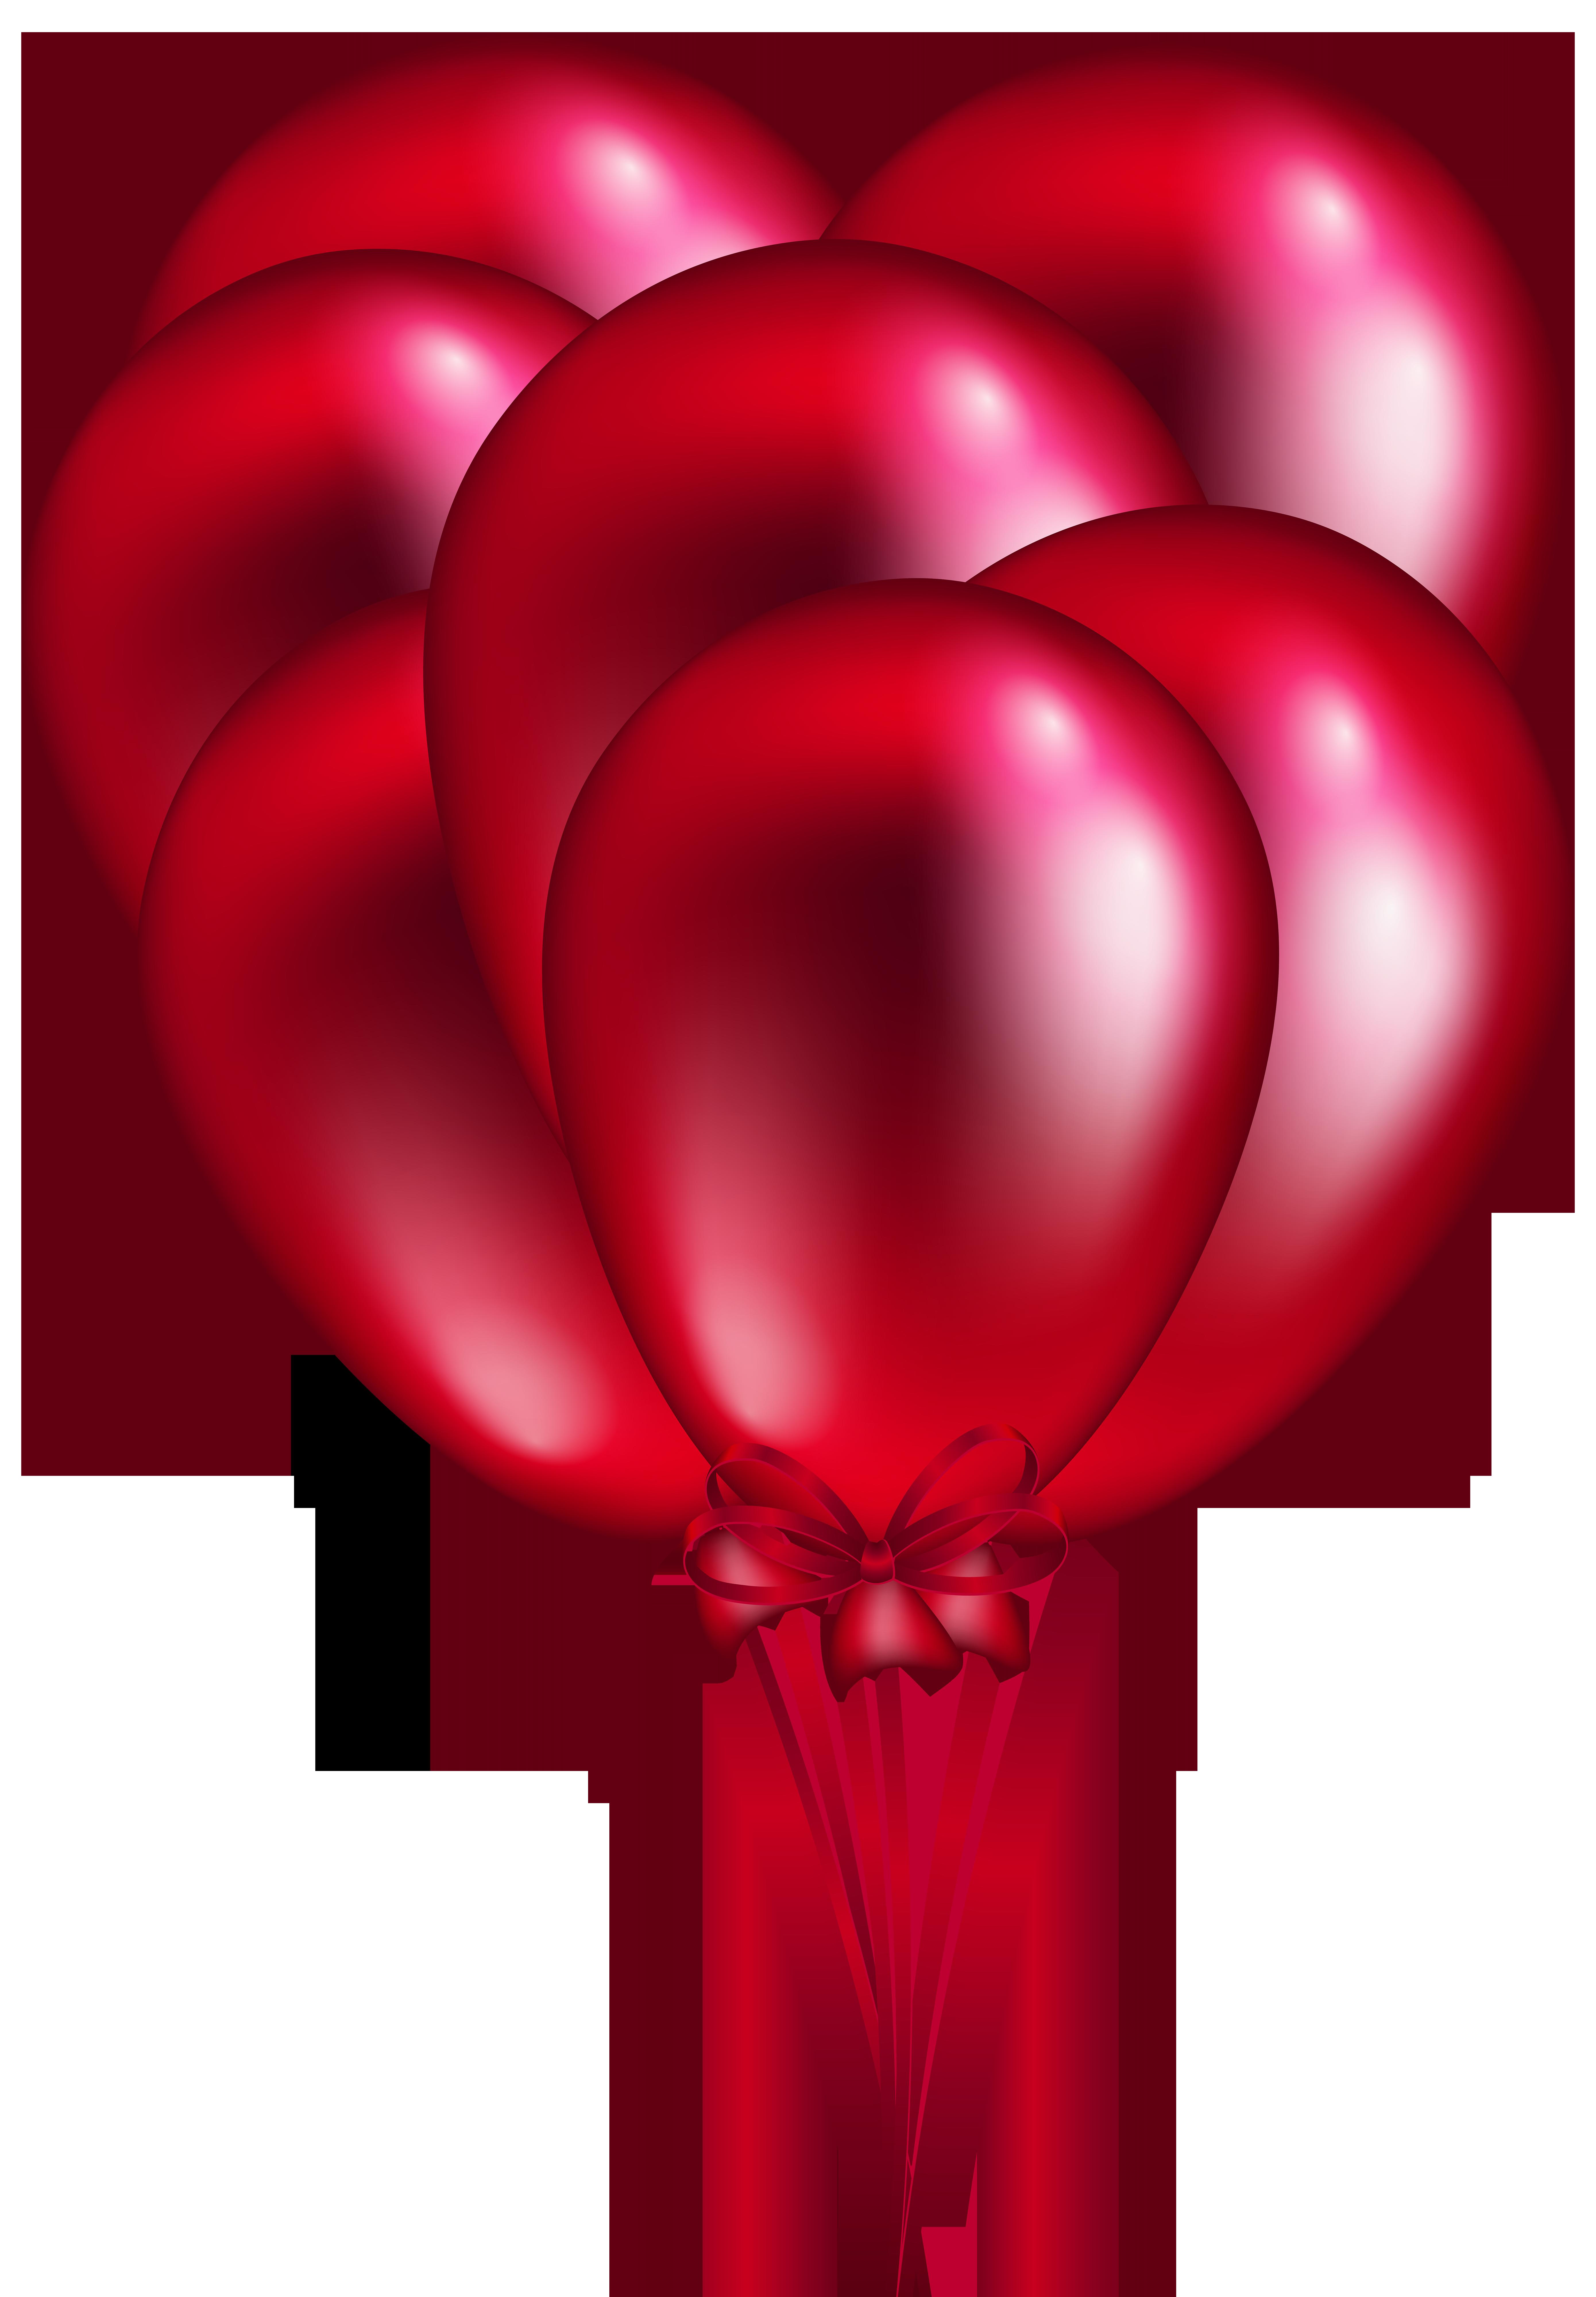 5558x8000 Red Balloon Bunch Png Clip Art